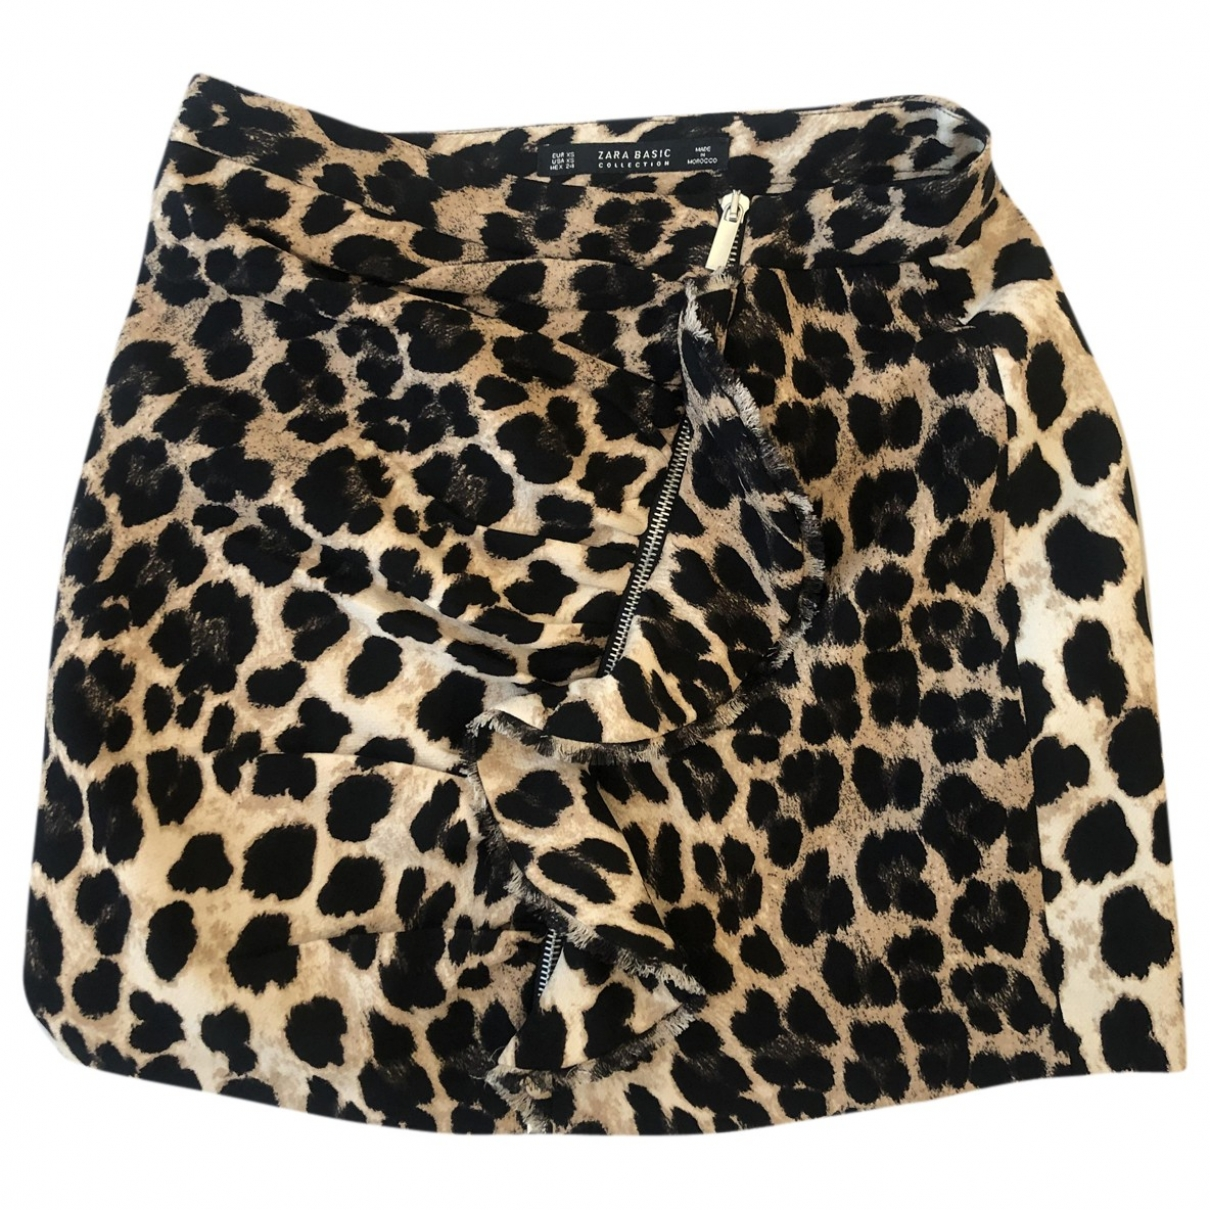 Zara - Jupe   pour femme en coton - elasthane - beige